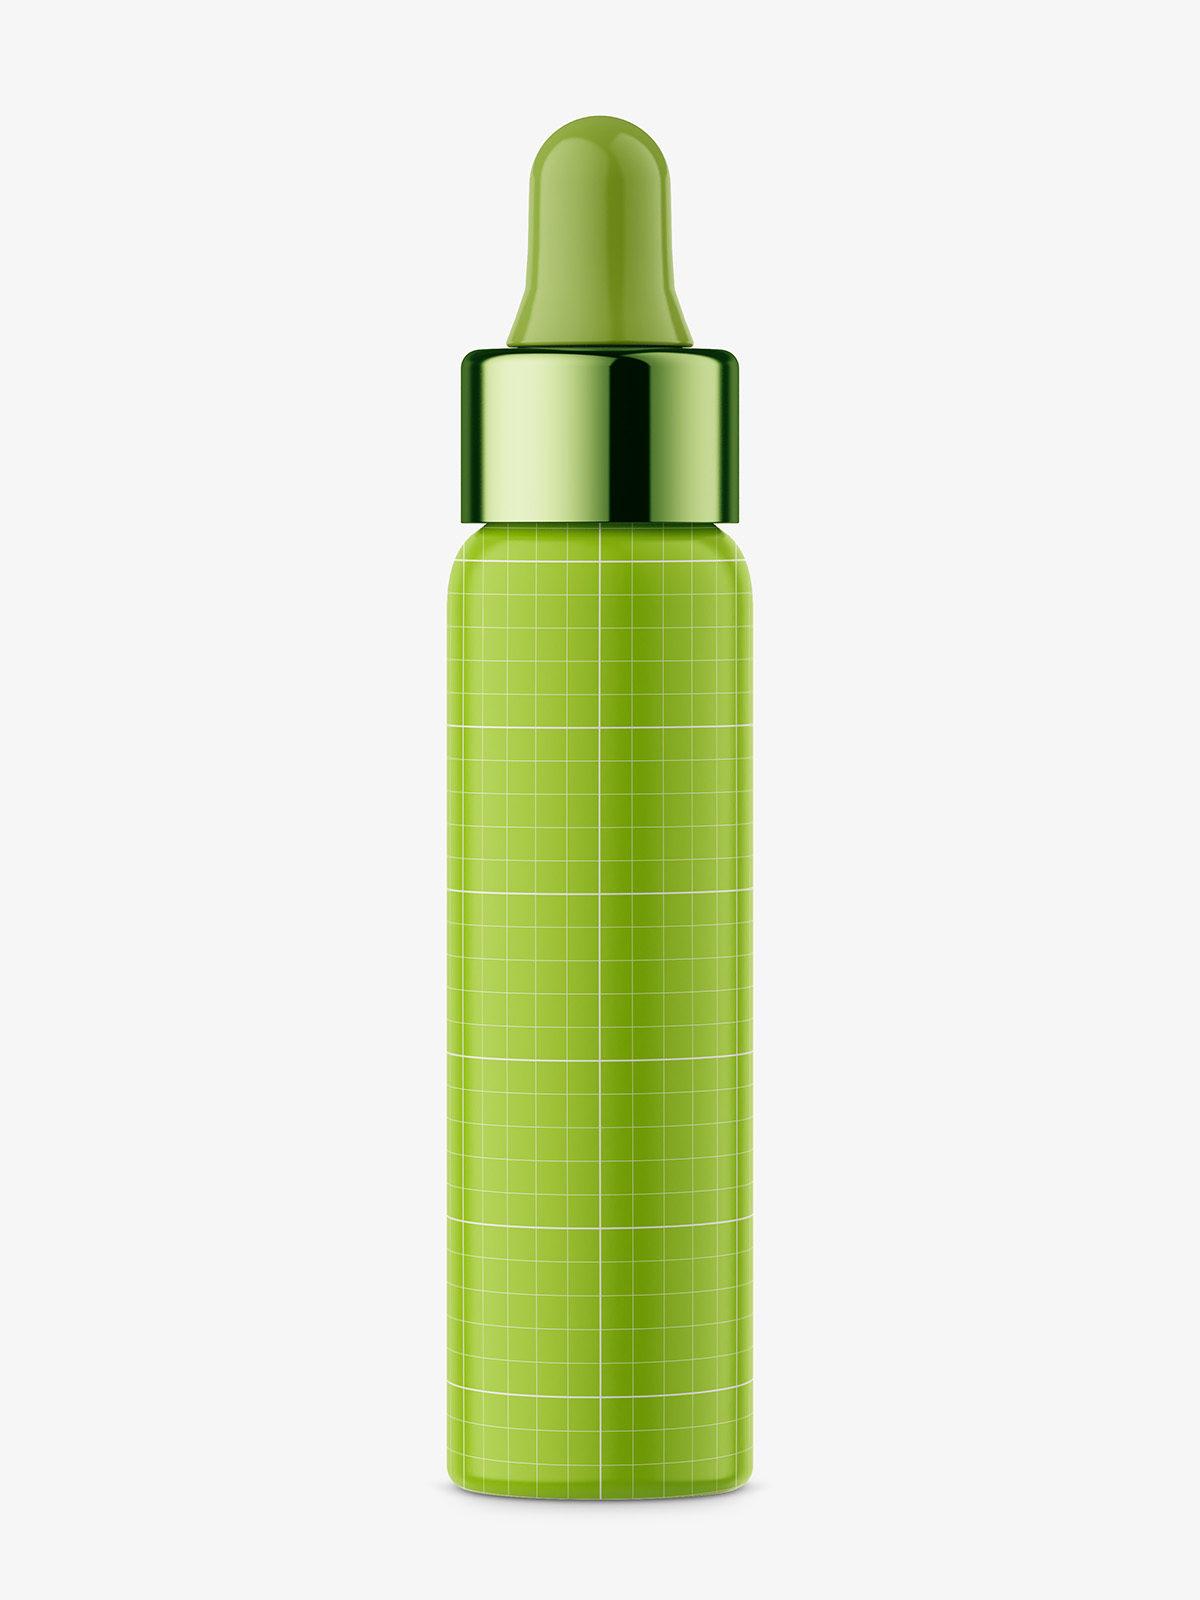 Dropper bottle with silver ring mockup / transparent